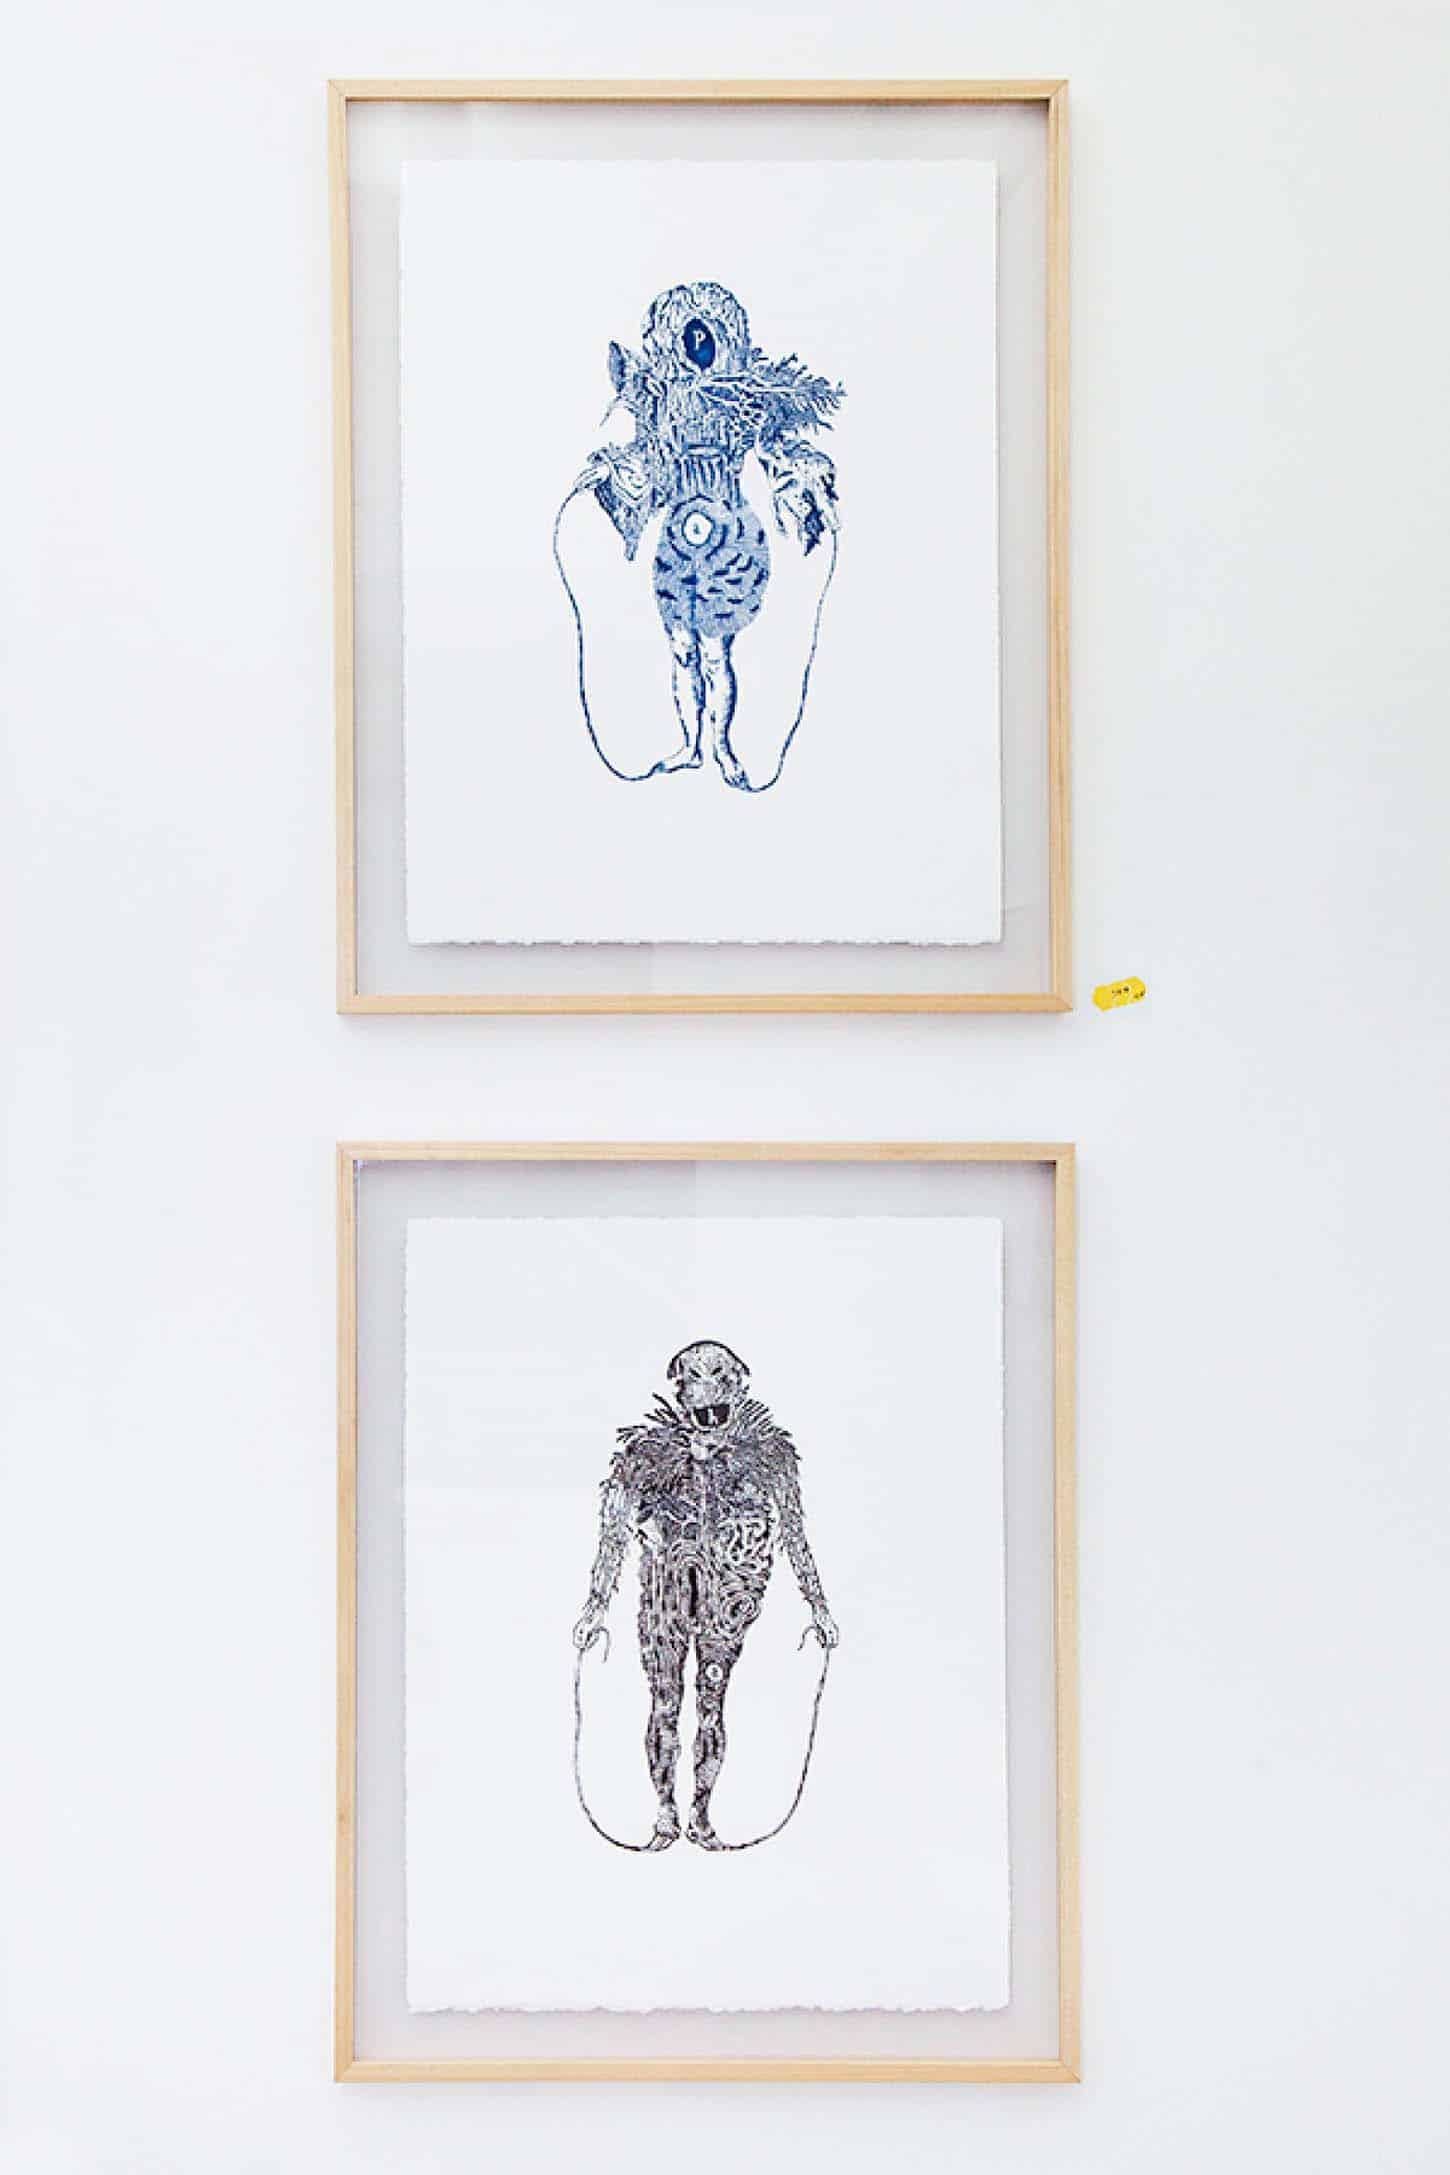 Espace A VENDRE, Exposition collective, Editions, avec la participation de Eudes Menichetti